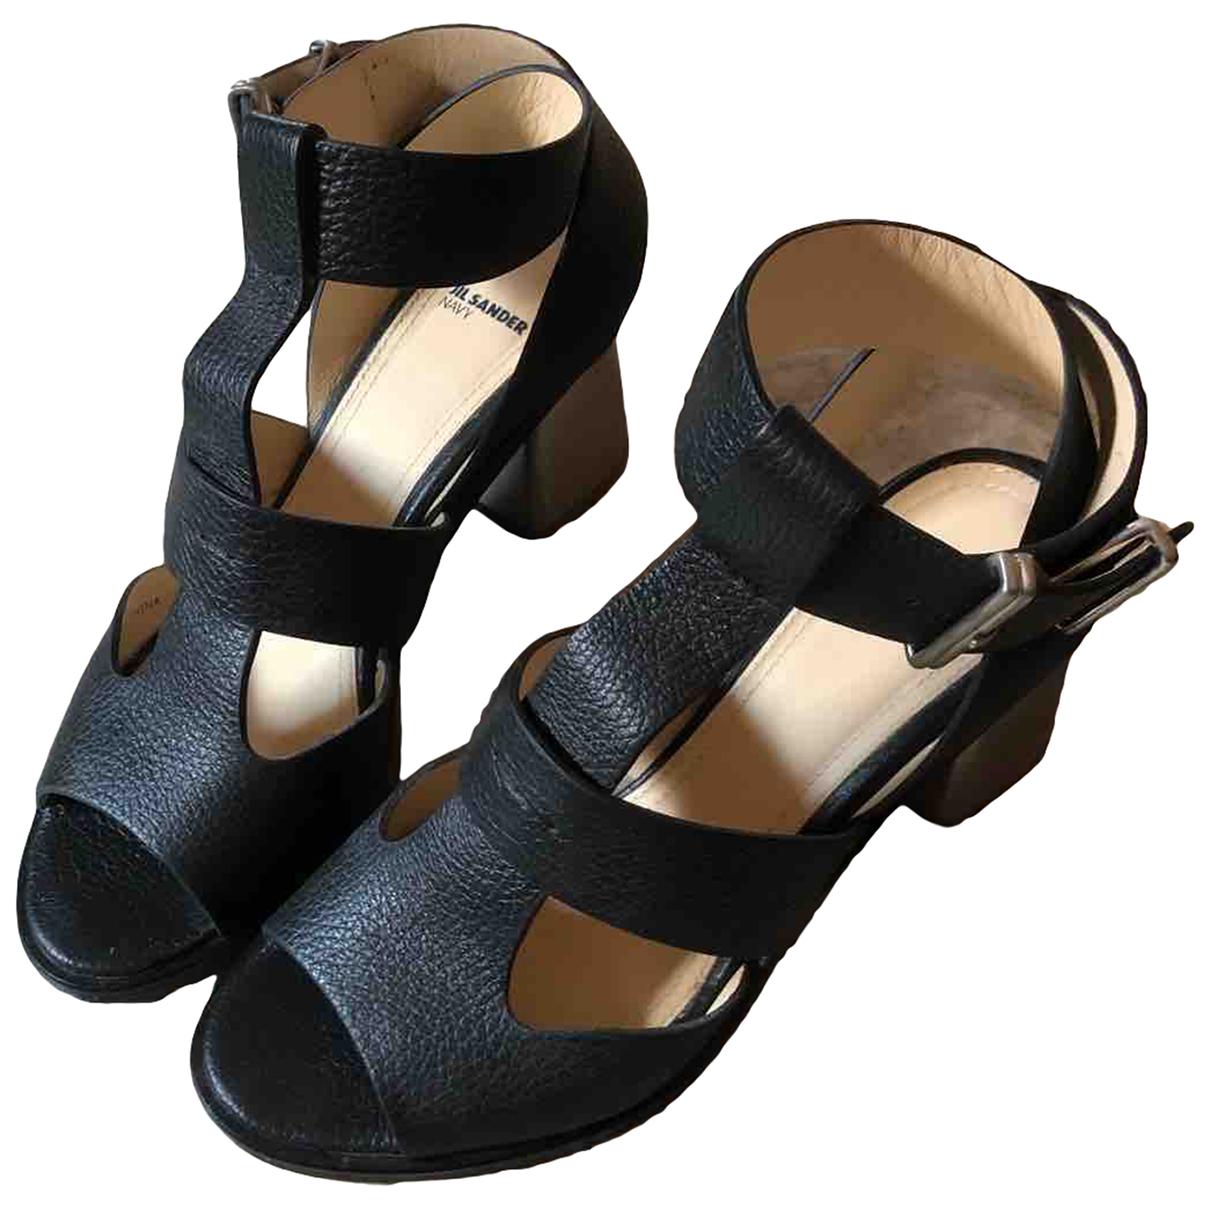 Jil Sander \N Black Leather Sandals for Women 37 IT